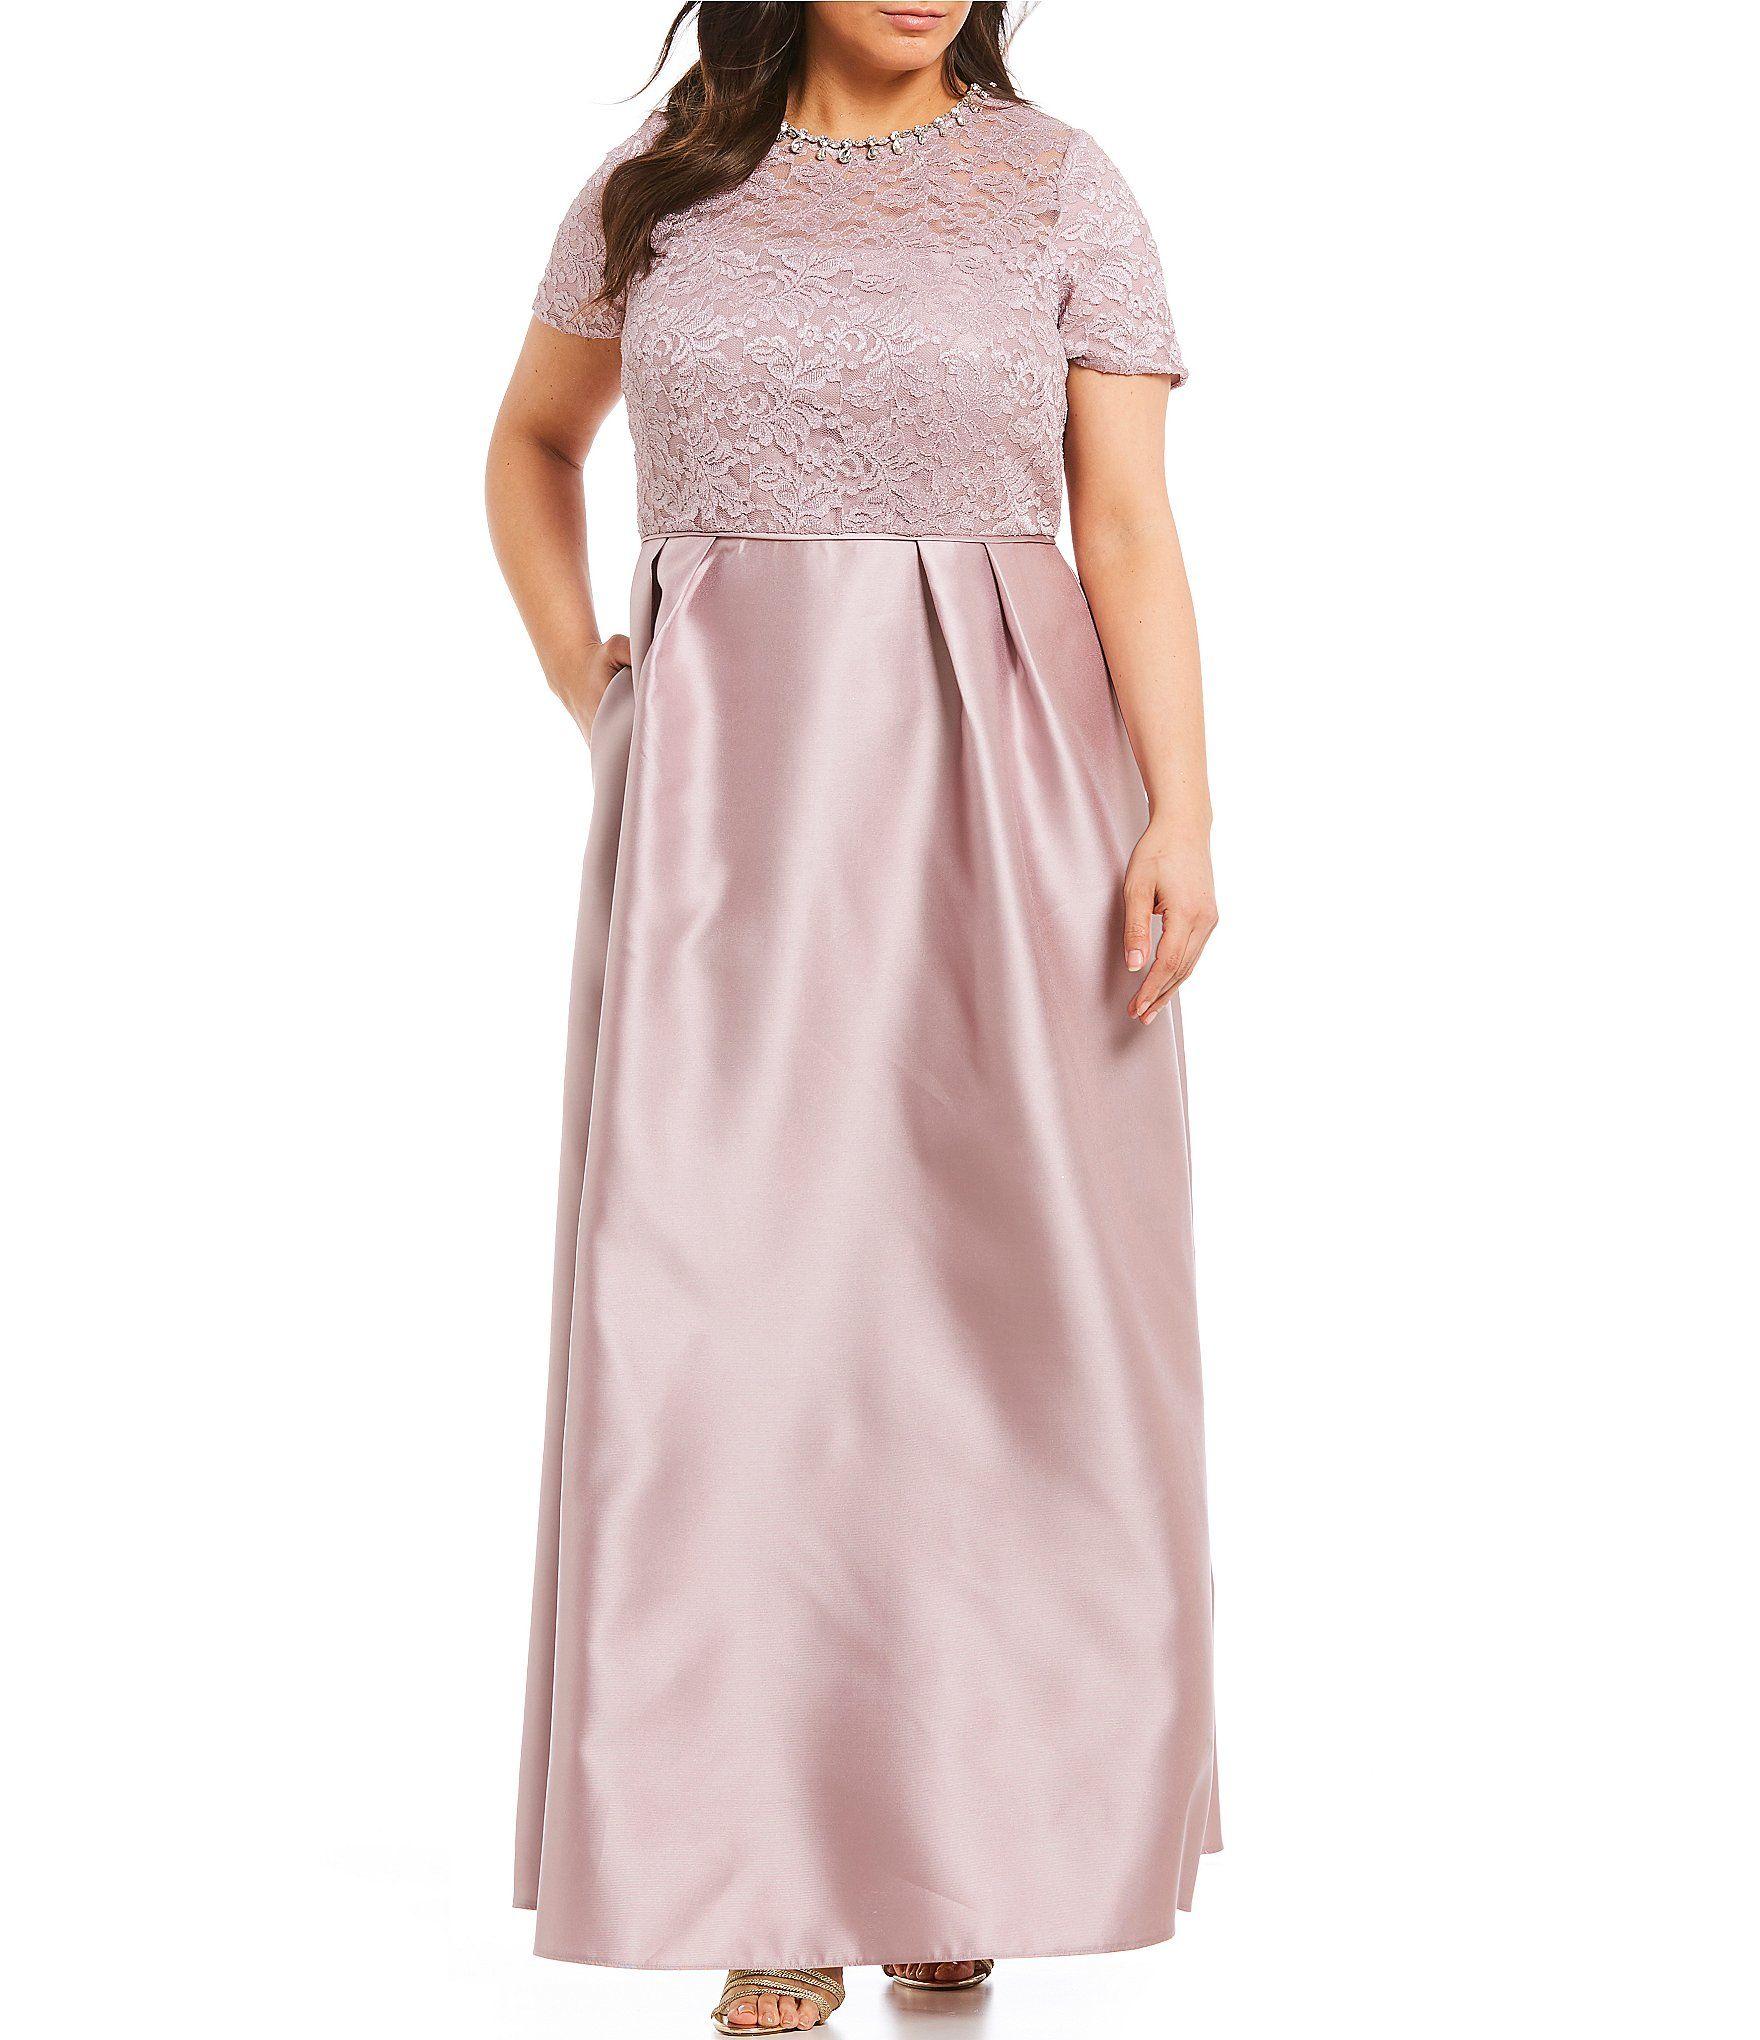 789ceb57e30 Ignite Evenings Plus Size Glitter Lace Short Sleeve Ballgown  Dillards